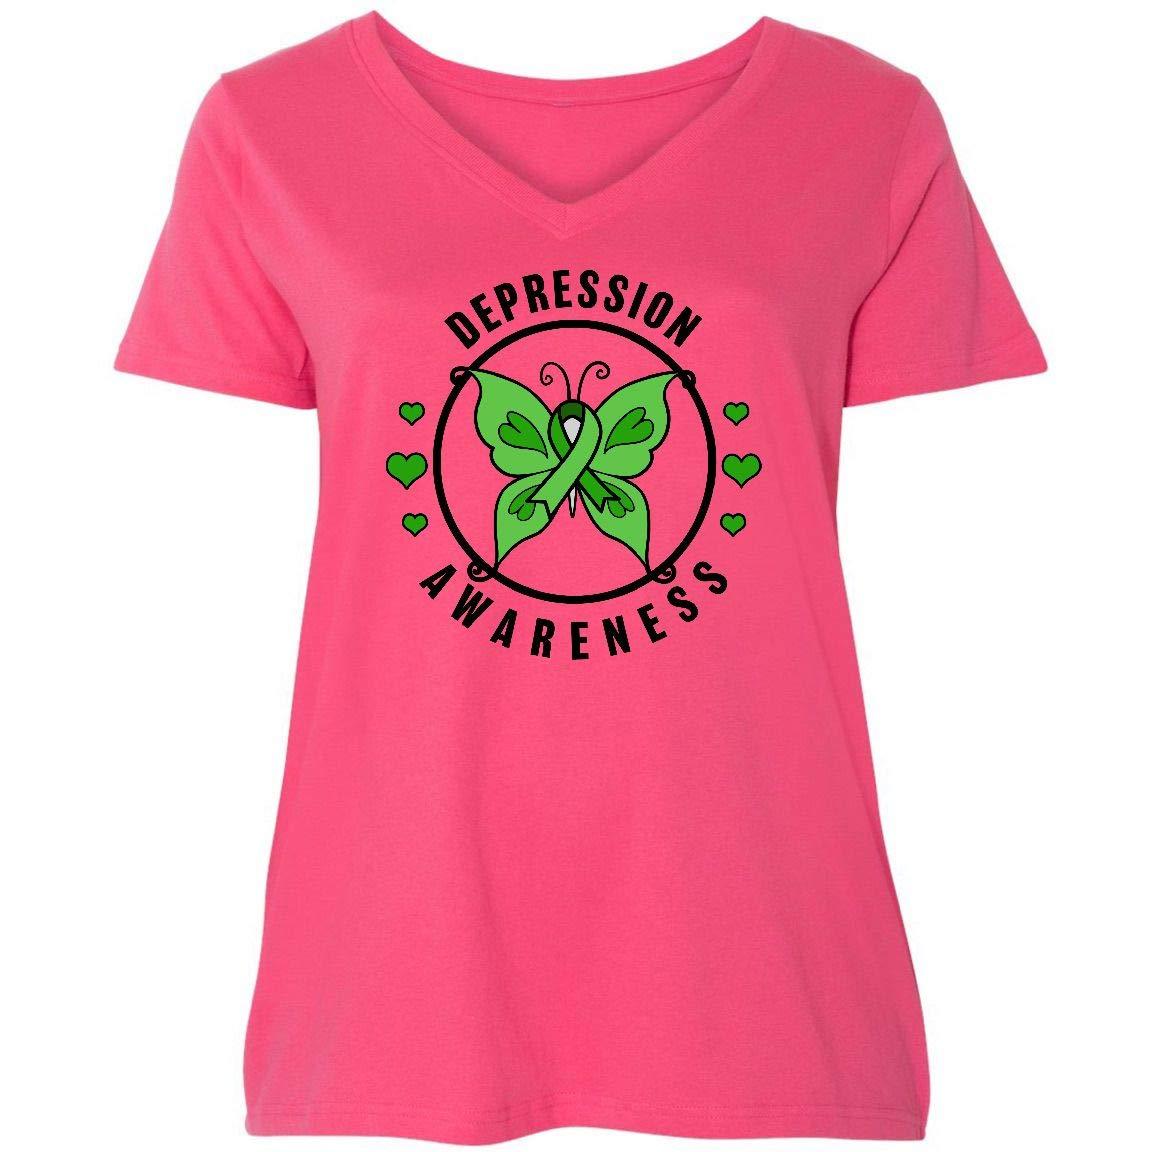 Cute Sweatshirt with Falbala PMsunglasses Short Sleeve Shit Happens T-Shirts for Children 2-6T